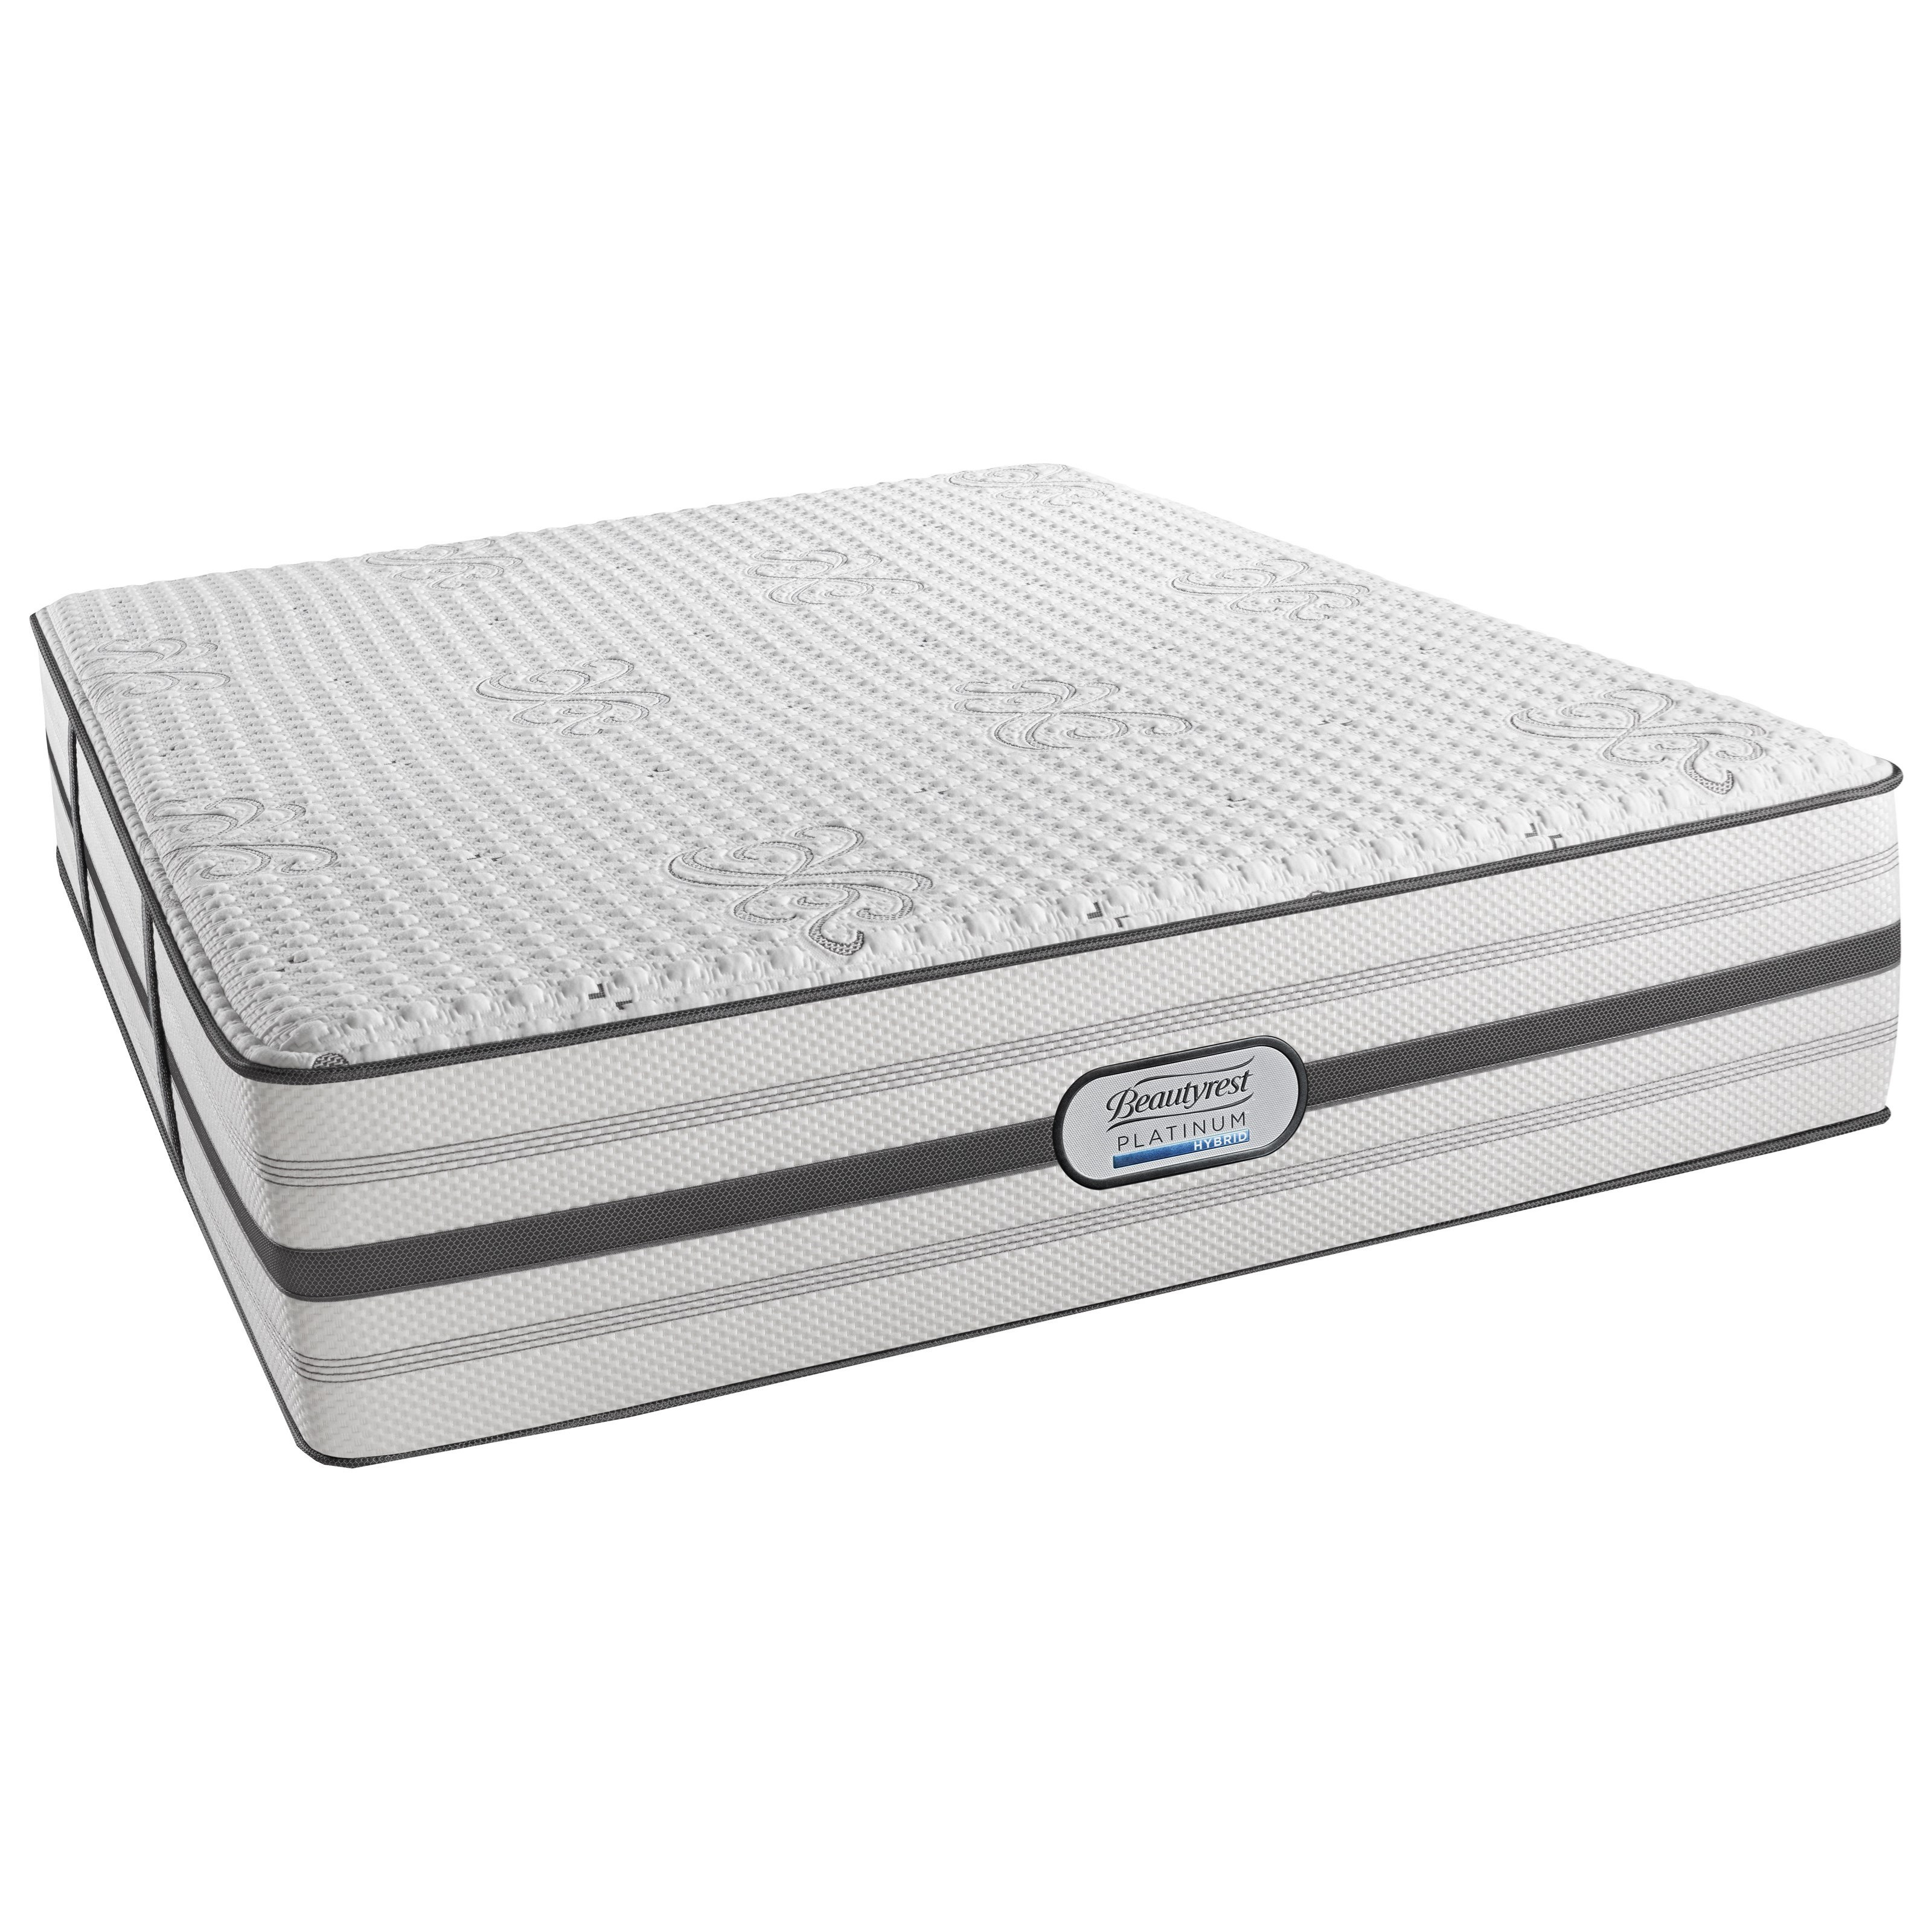 Beautyrest Platinum Austin Cal King Luxury Firm Adjustable Set - Item Number: BRHLV1LF-CK+2xSM3-SPCK